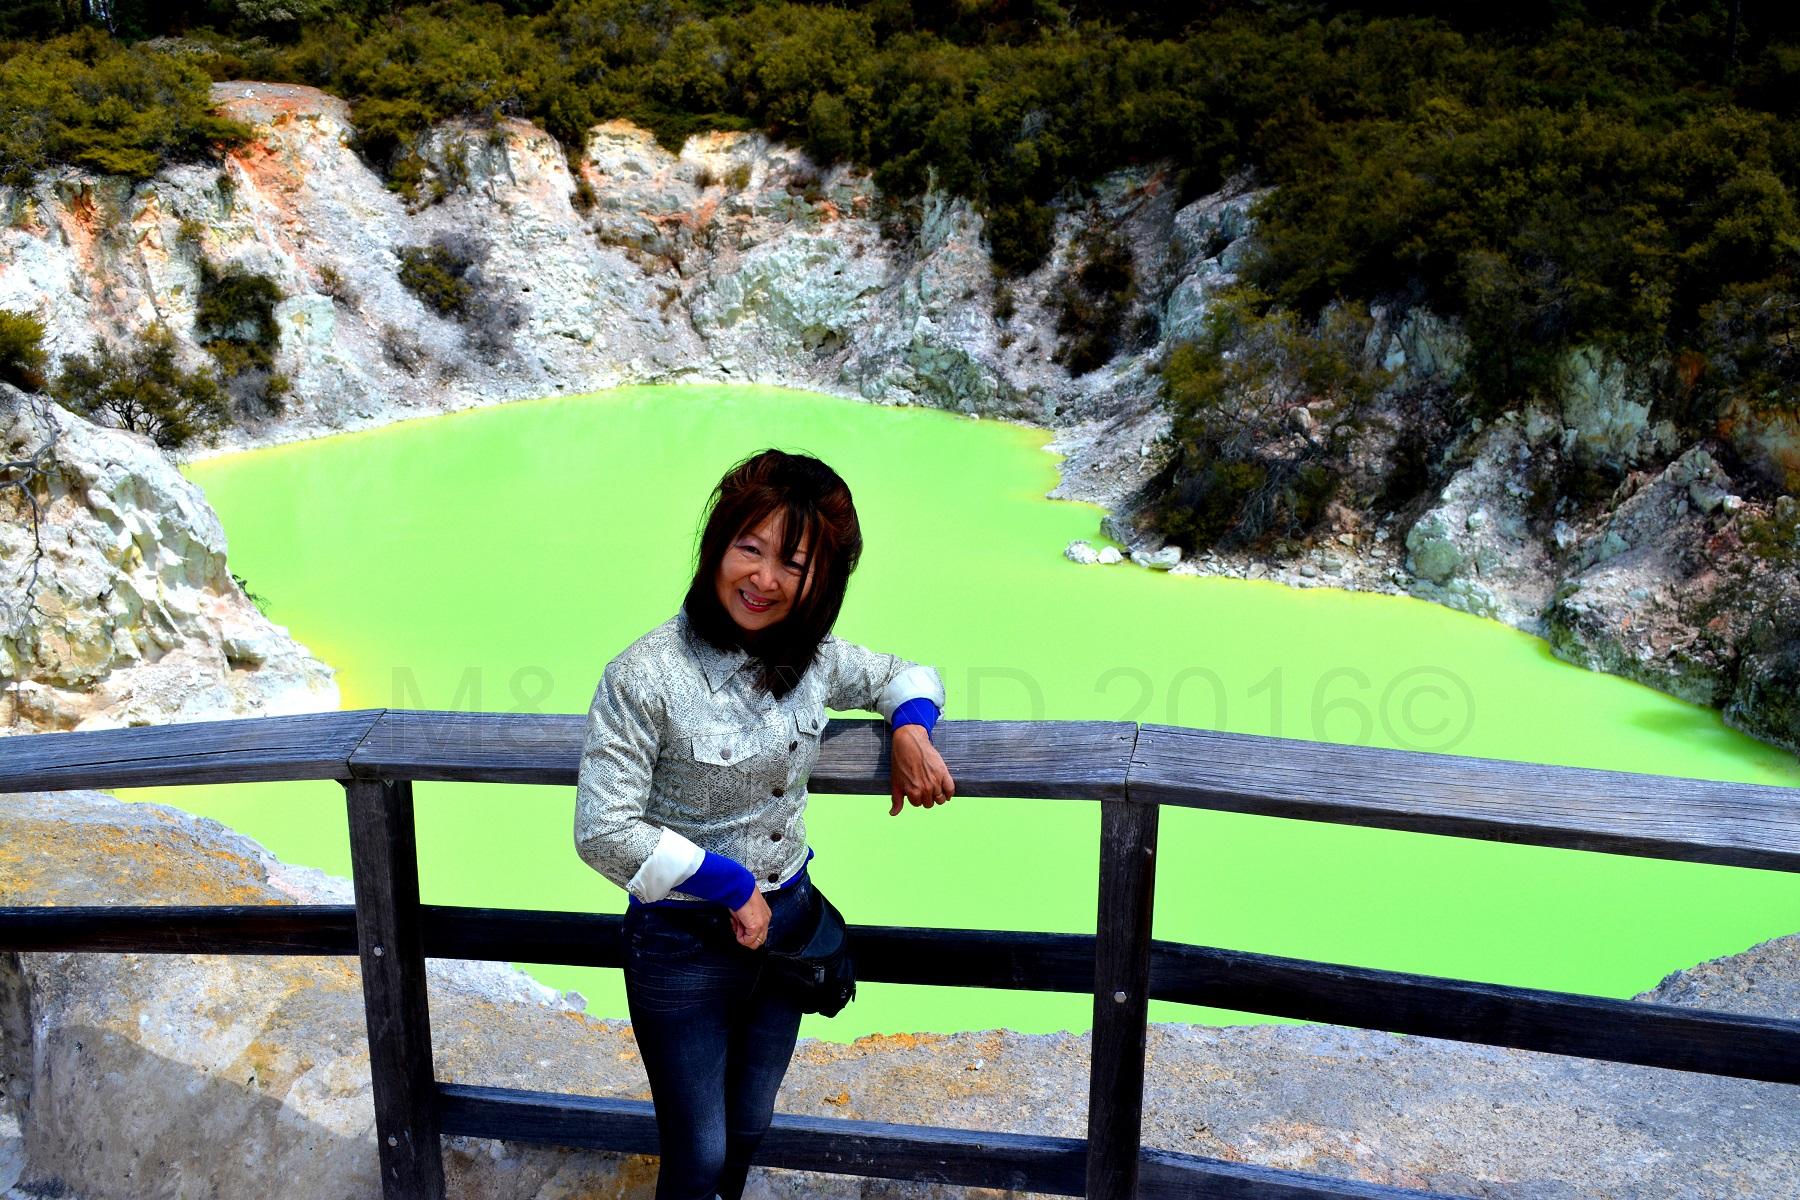 Green pool, Wai-o-tapu Thermal Wonderland, Rotorua, NZ